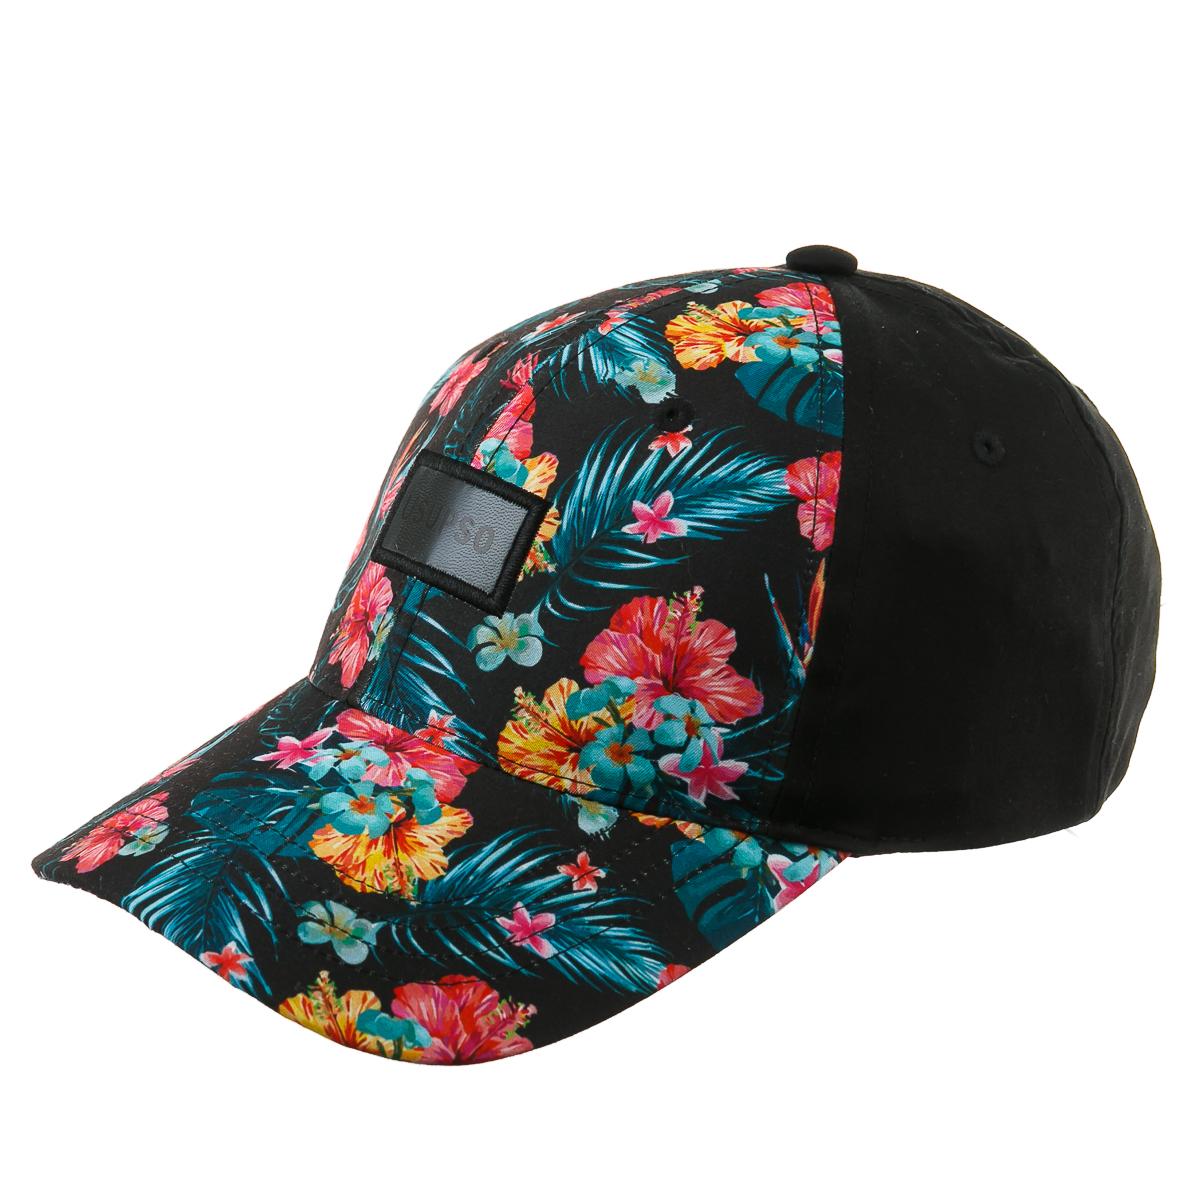 Кепка черная с яркими цветами